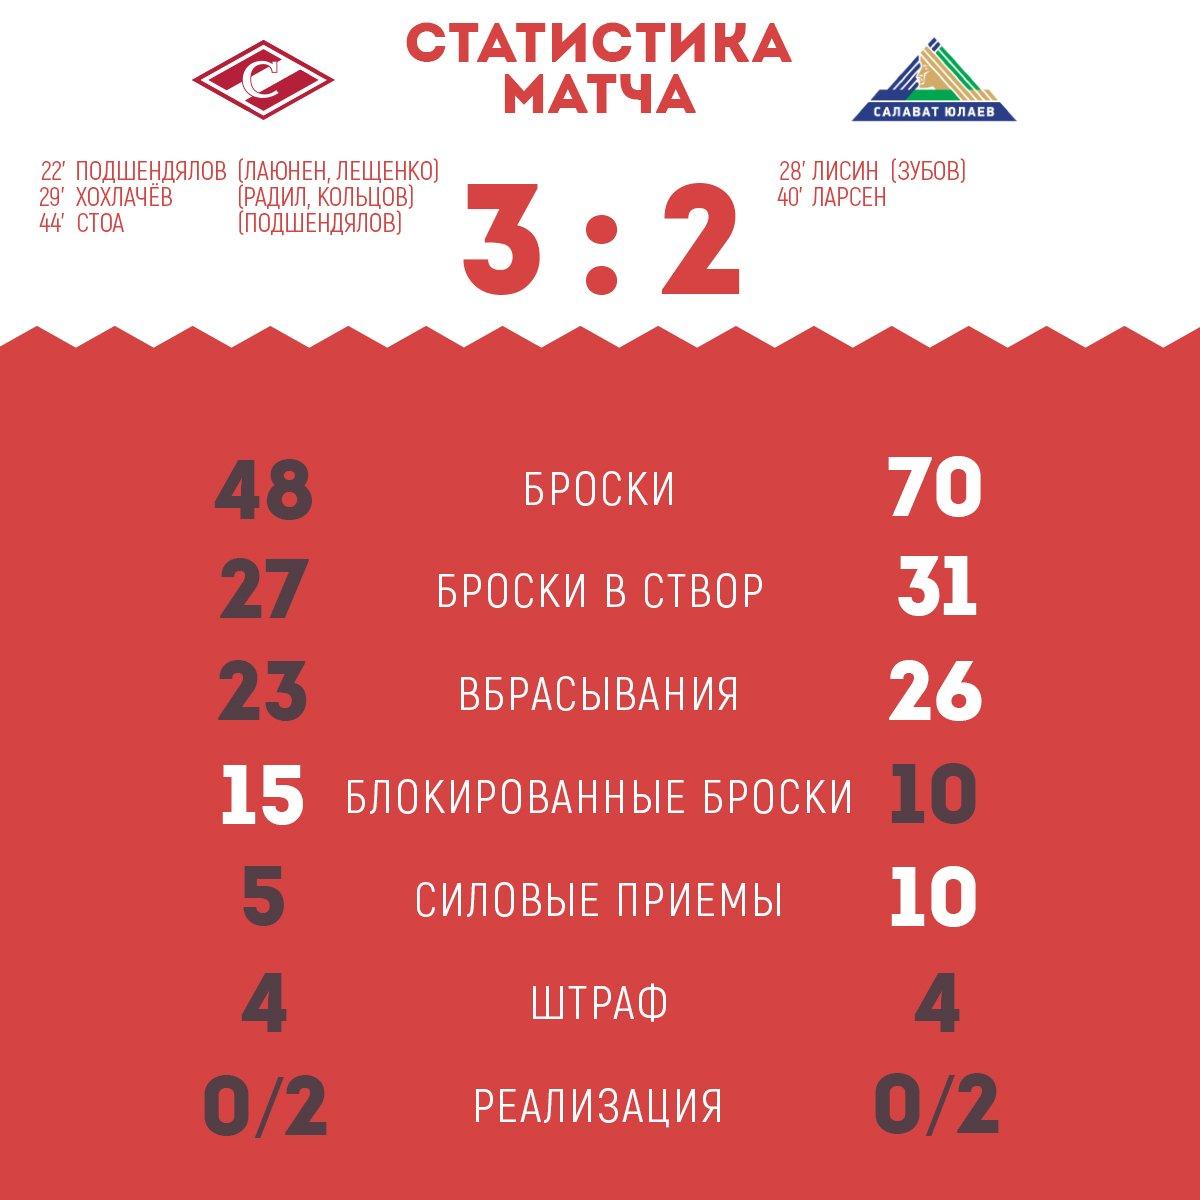 Статистика матча «Спартак» - «Салават Юлаев» 3:2